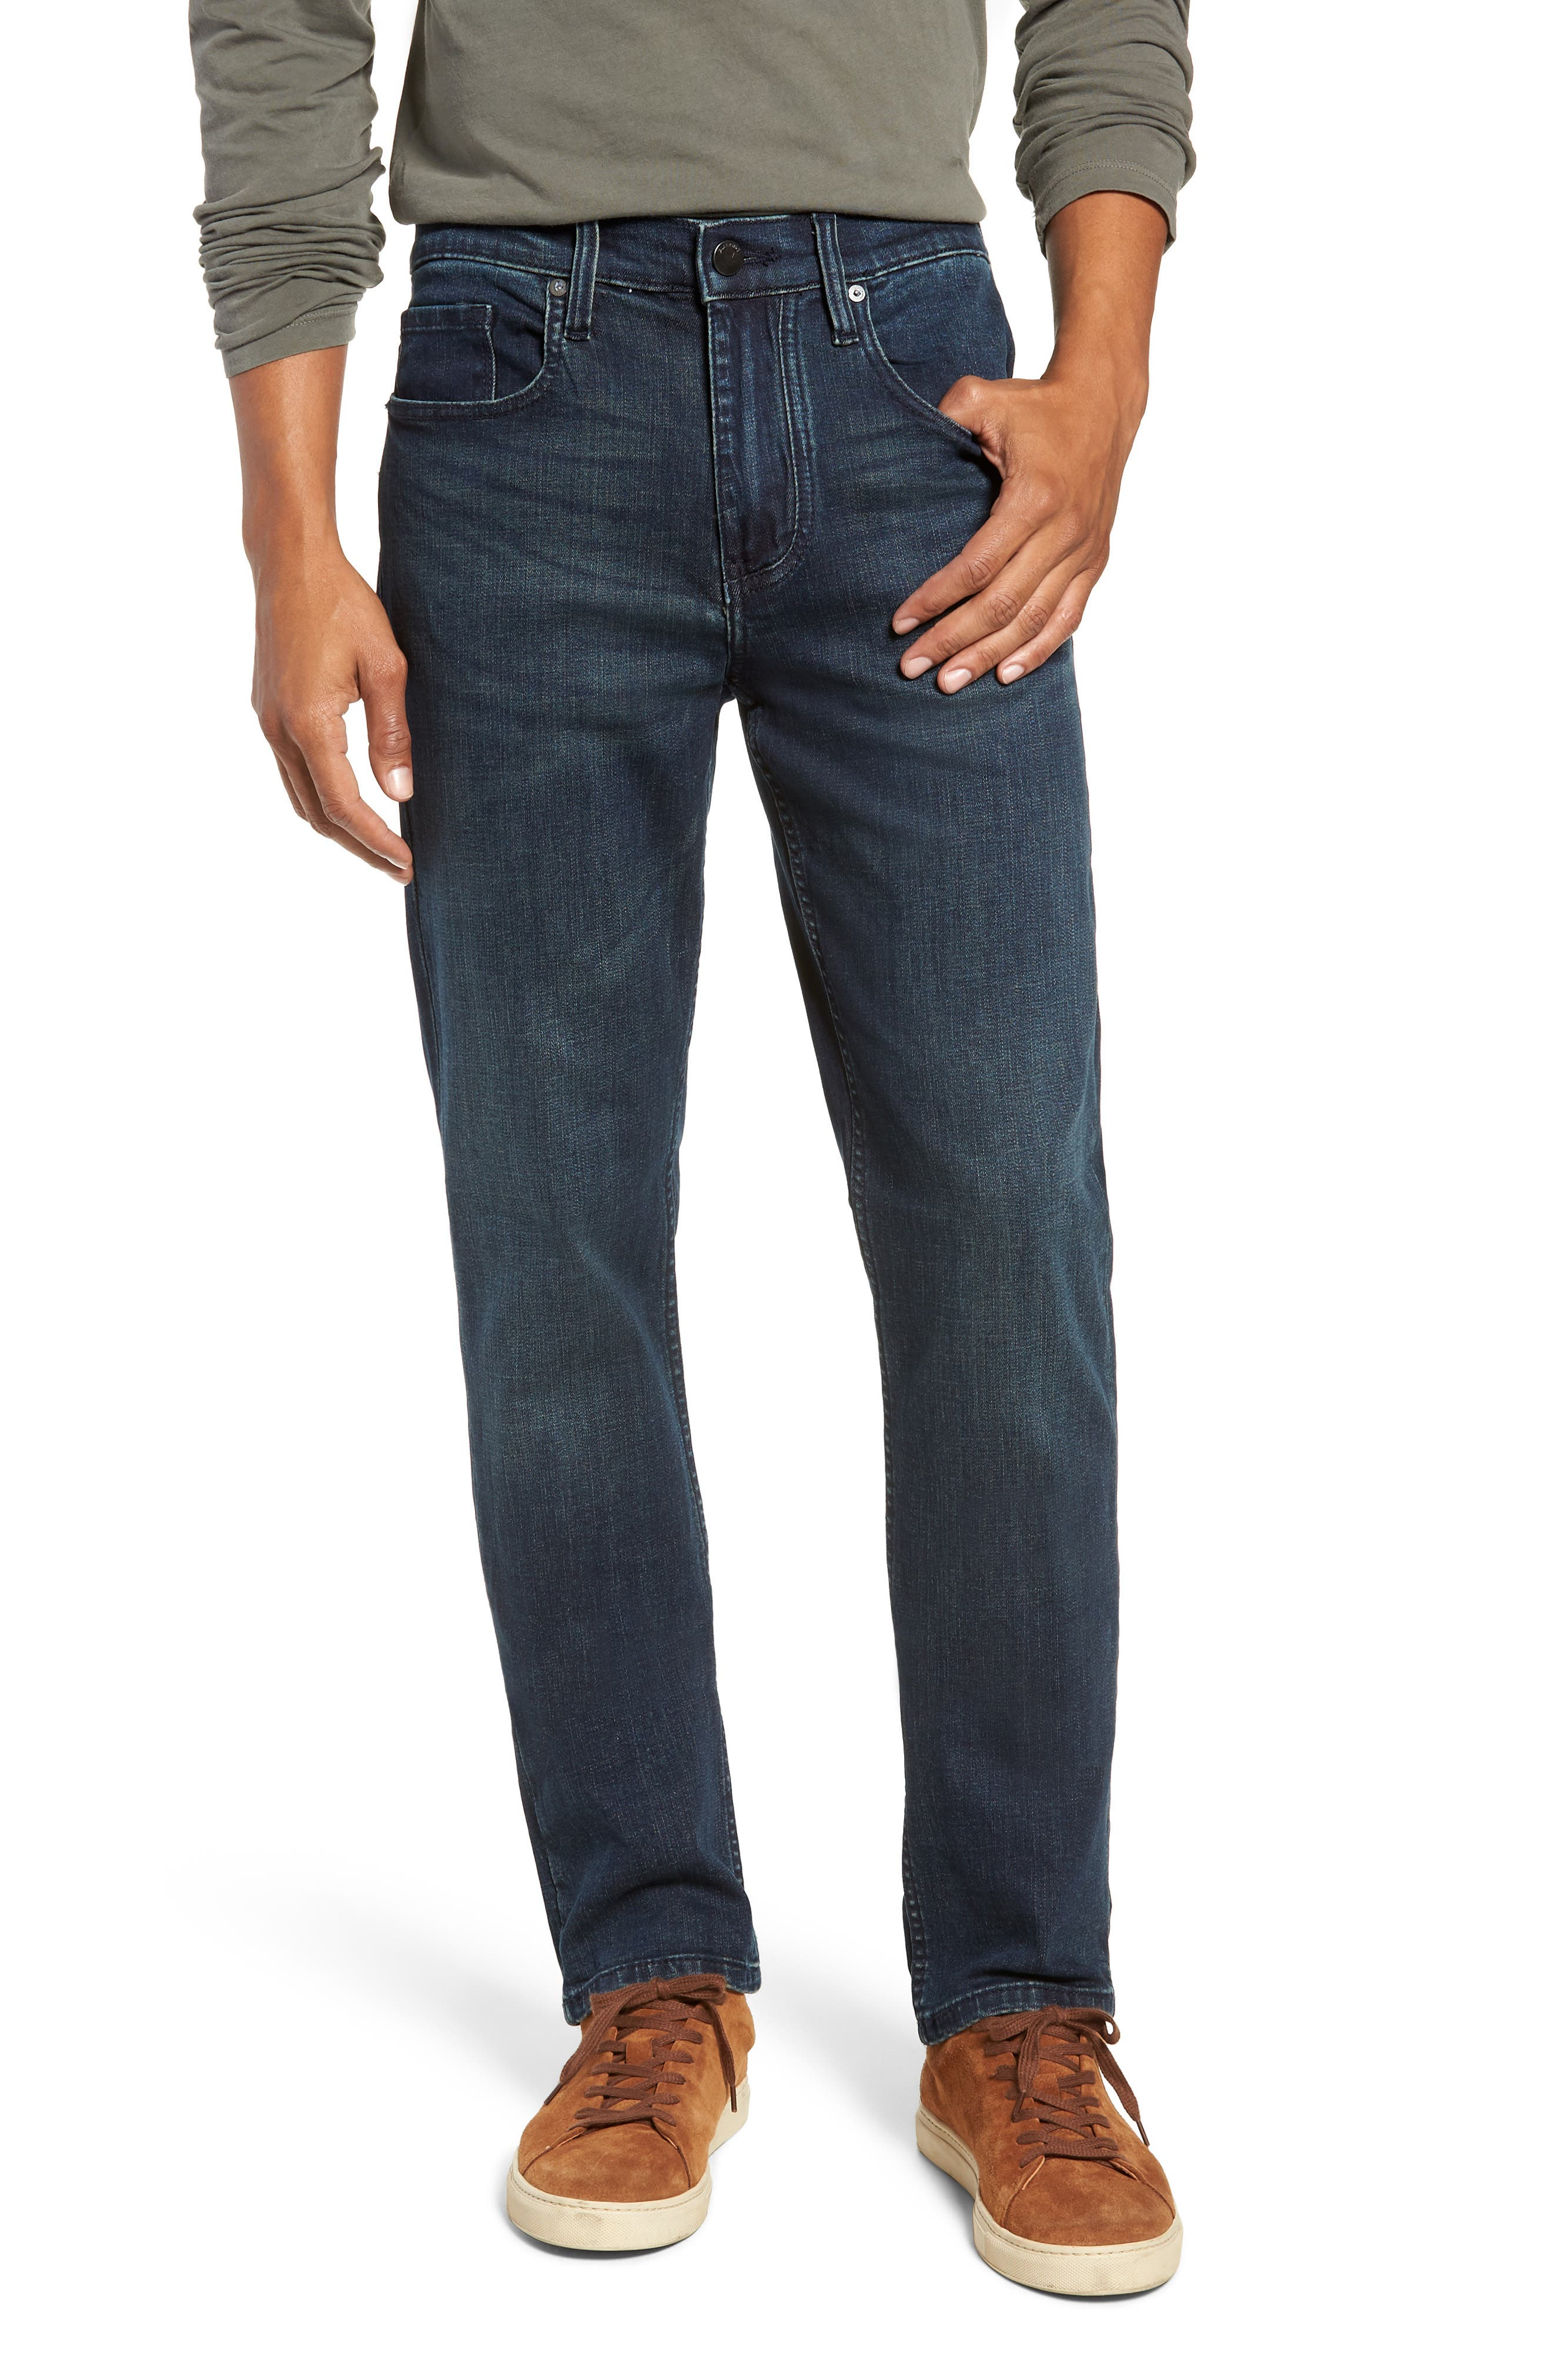 Stanton Straight Leg Jeans,                             Main thumbnail 1, color,                             WORTHLESS TENDENCY